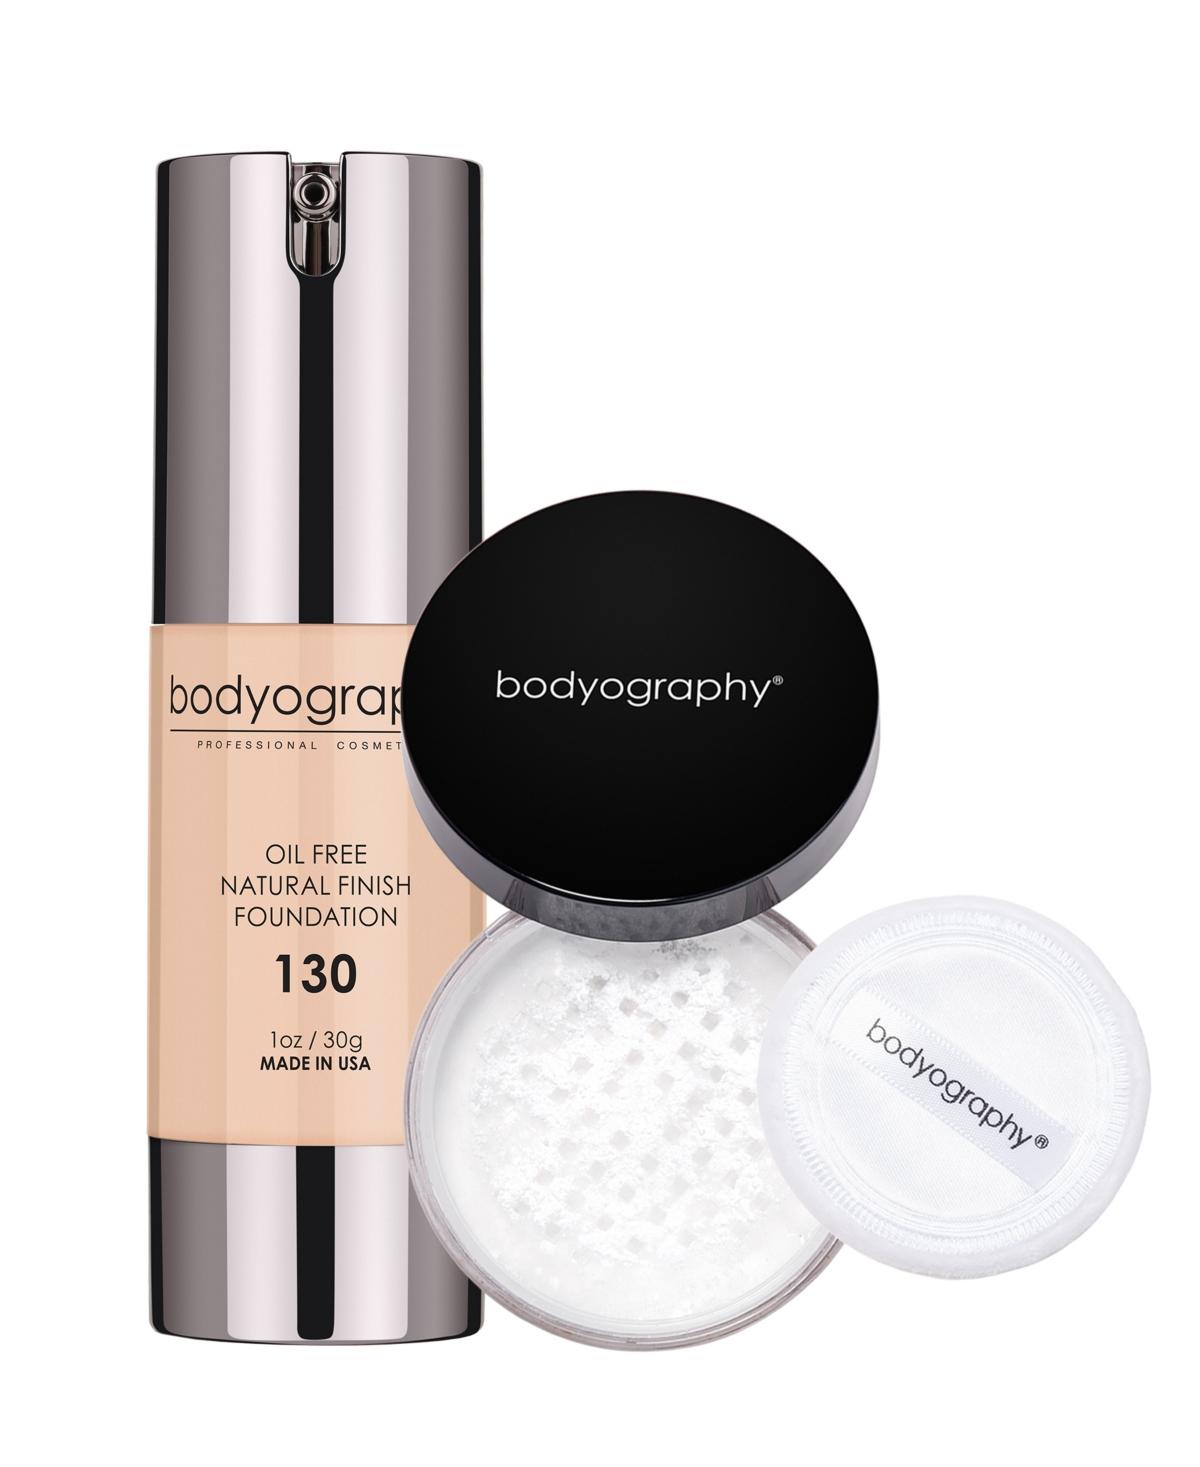 Bodyography Flawless Complexion Bundle